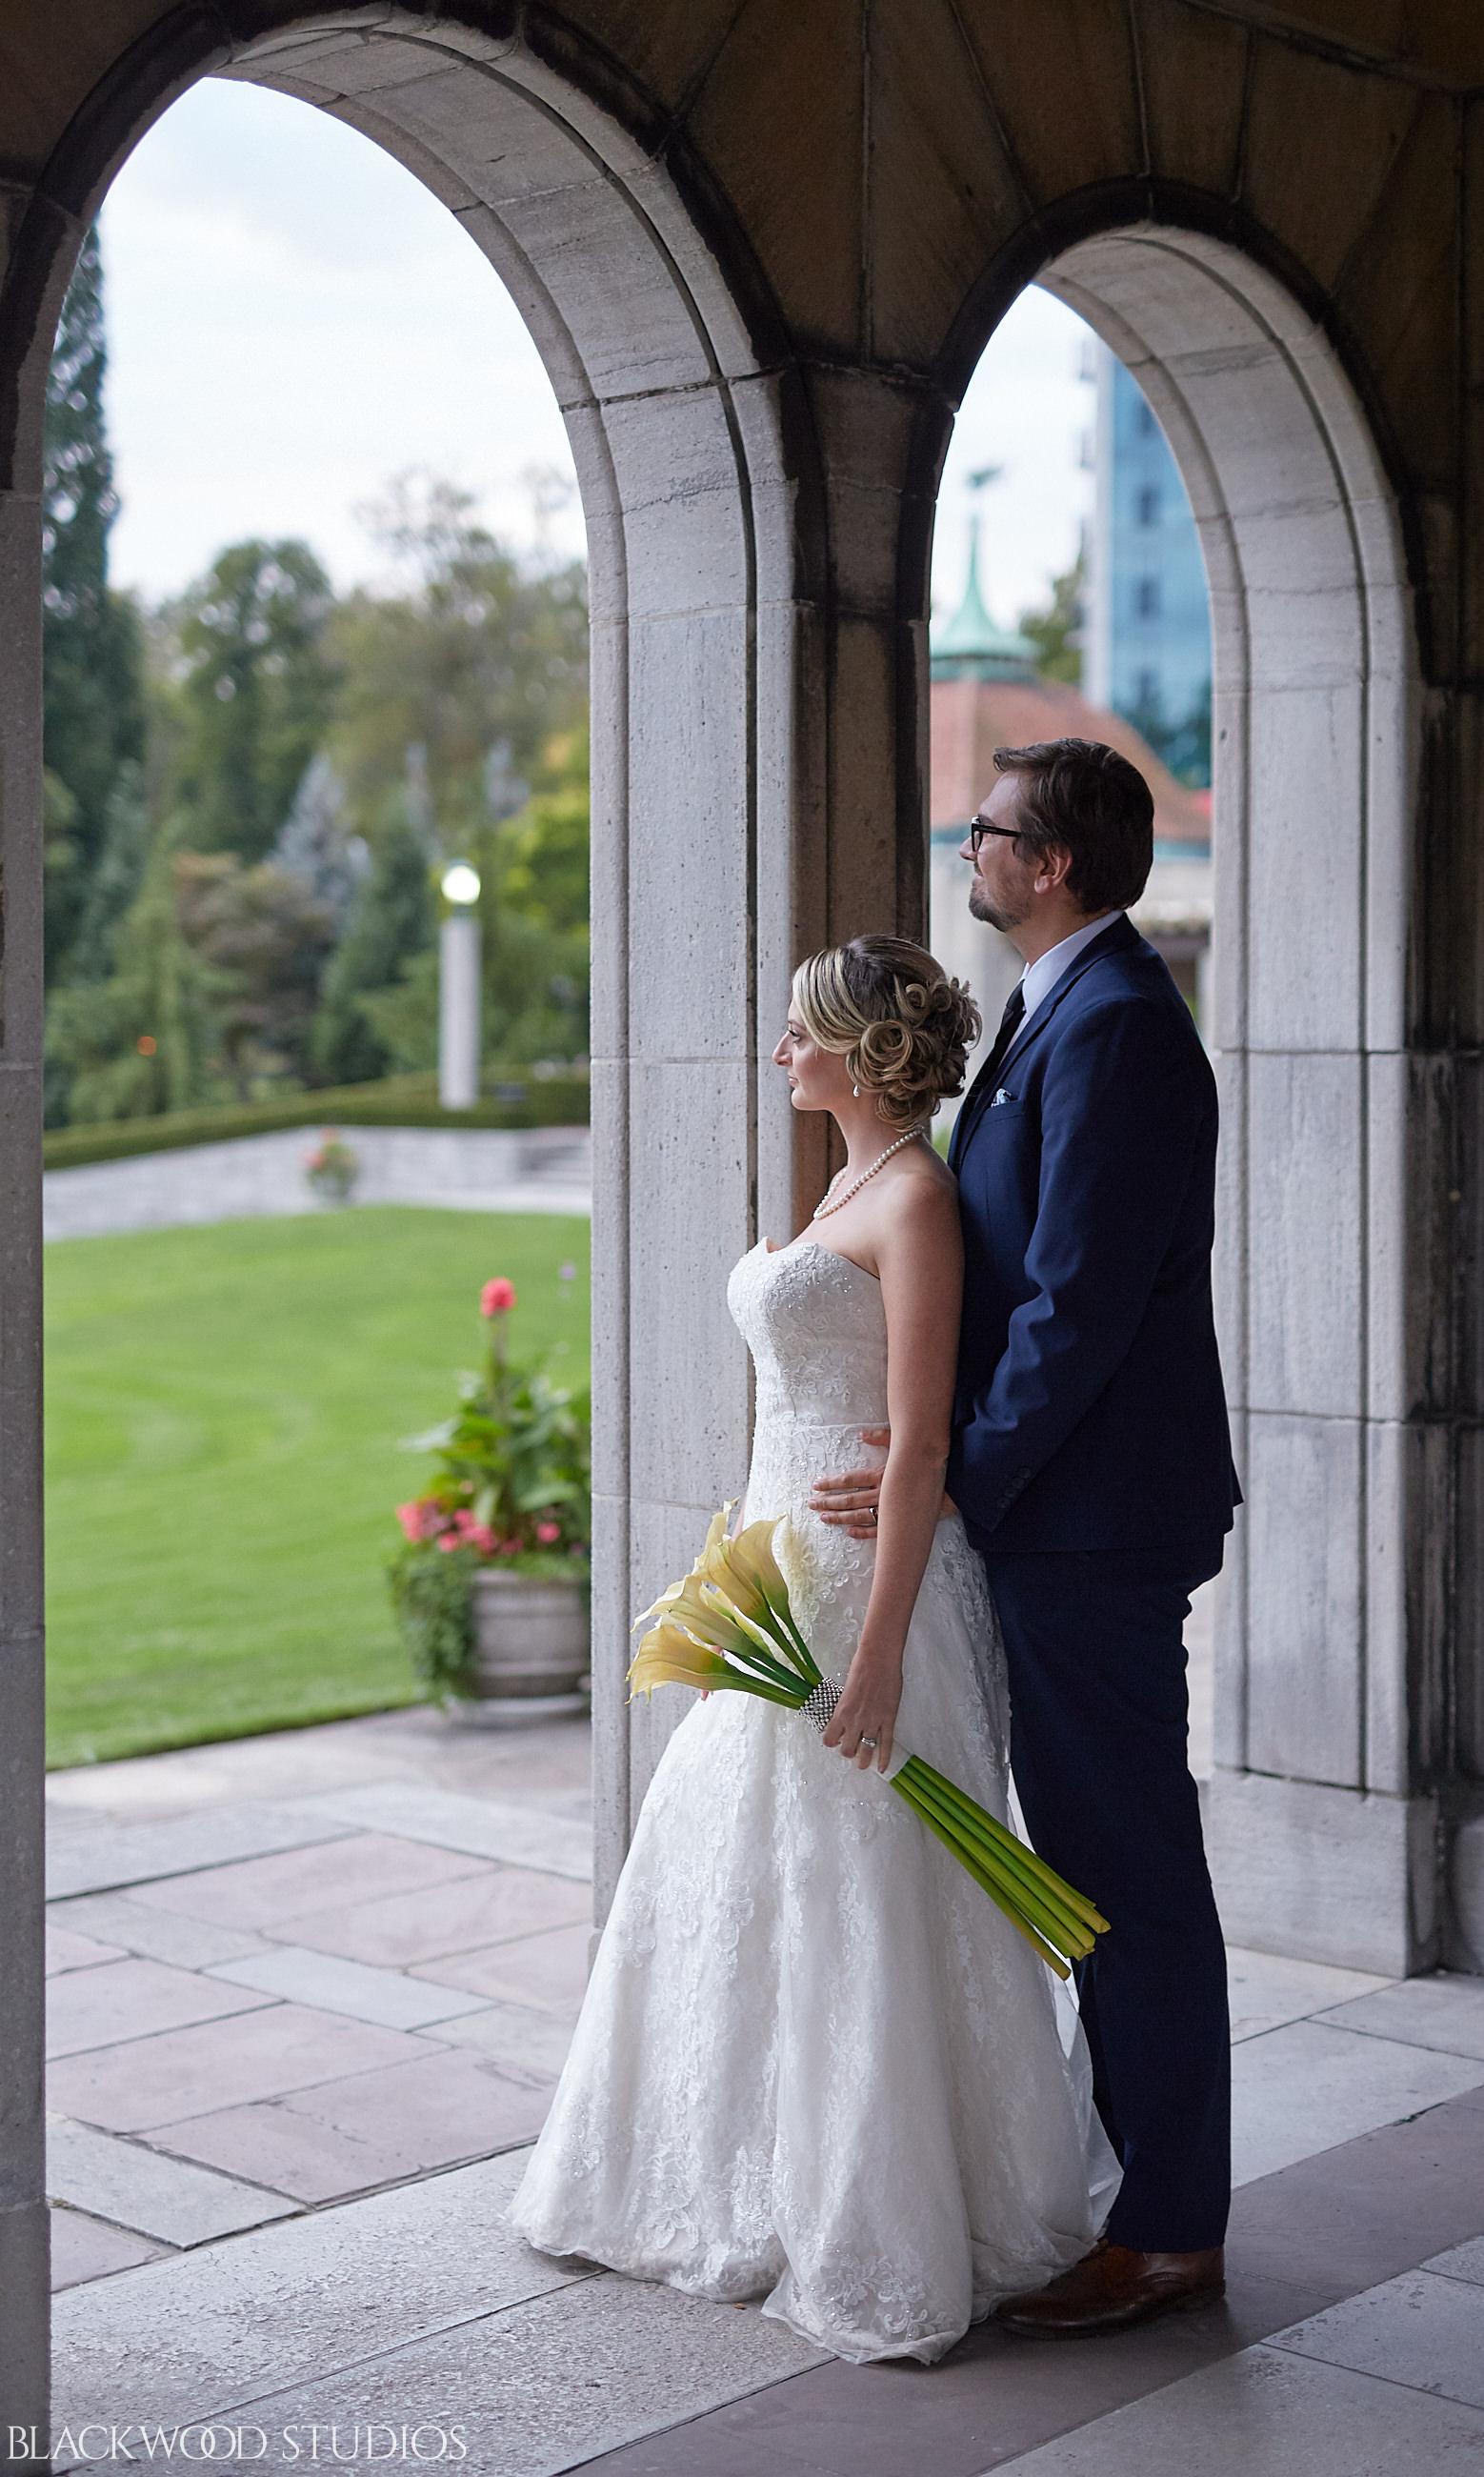 Blackwood-Studios-Wedding-Photography-20170928-184051-Marek-Katie-Michalek-Oakes-Garden-Theatre-Niagara-Falls-Ontario-Canada.jpg